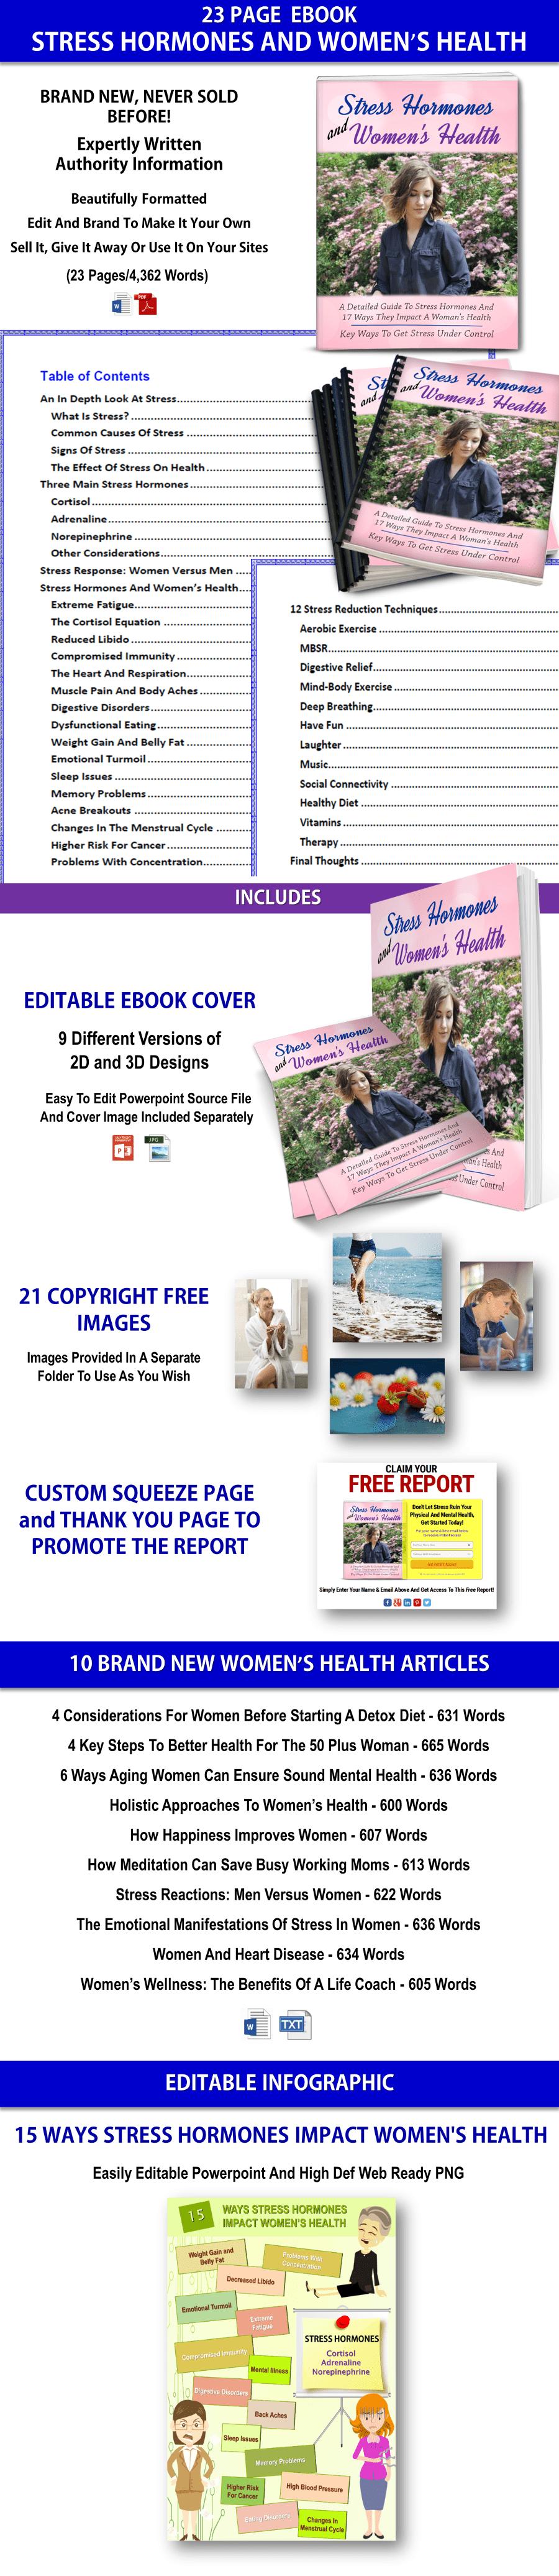 Stress Hormones And Women's Health PLR Pack